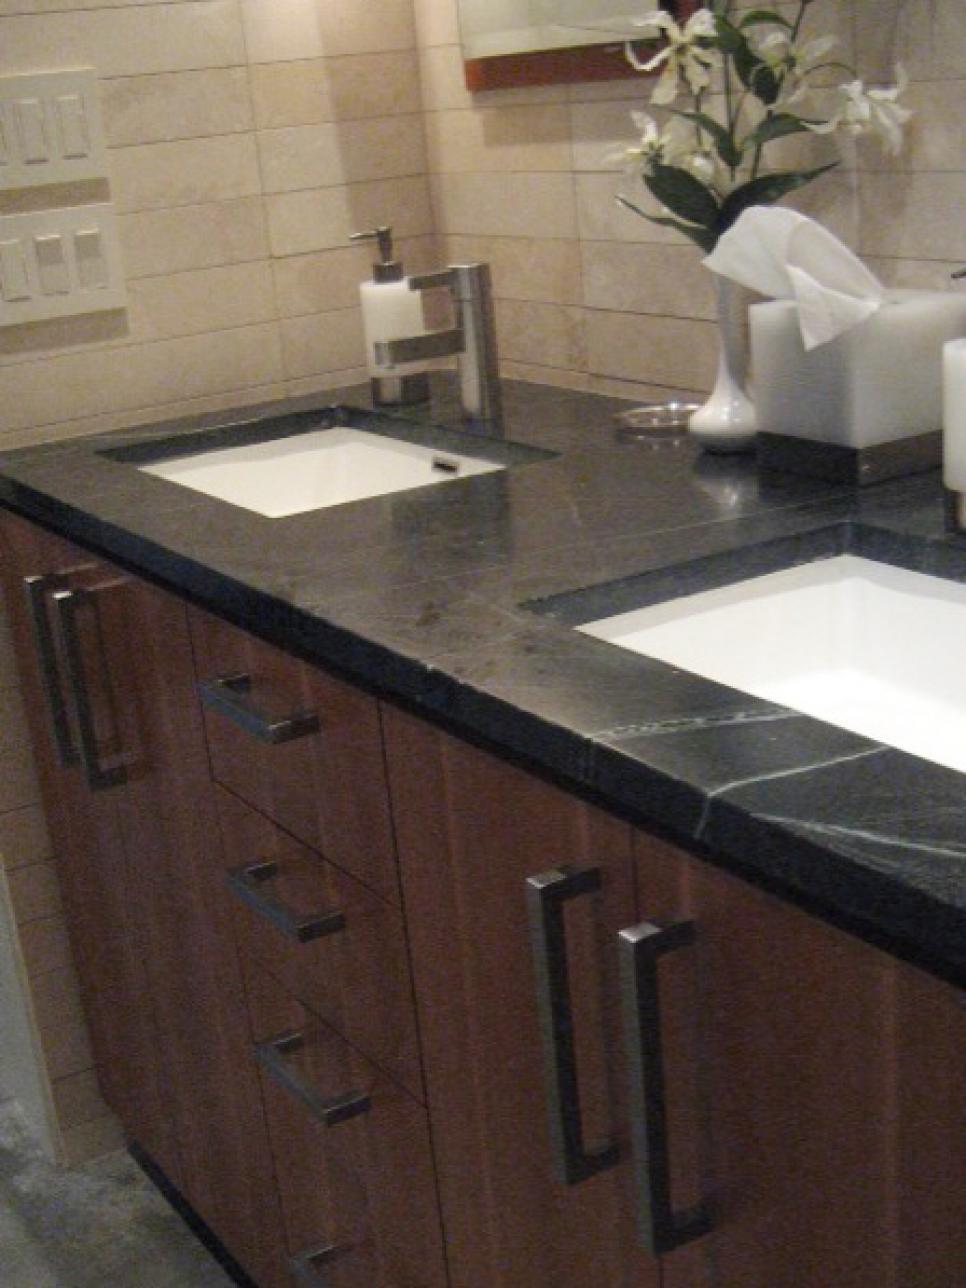 Pictures of Alternative Stone Bathroom Countertops HGTV